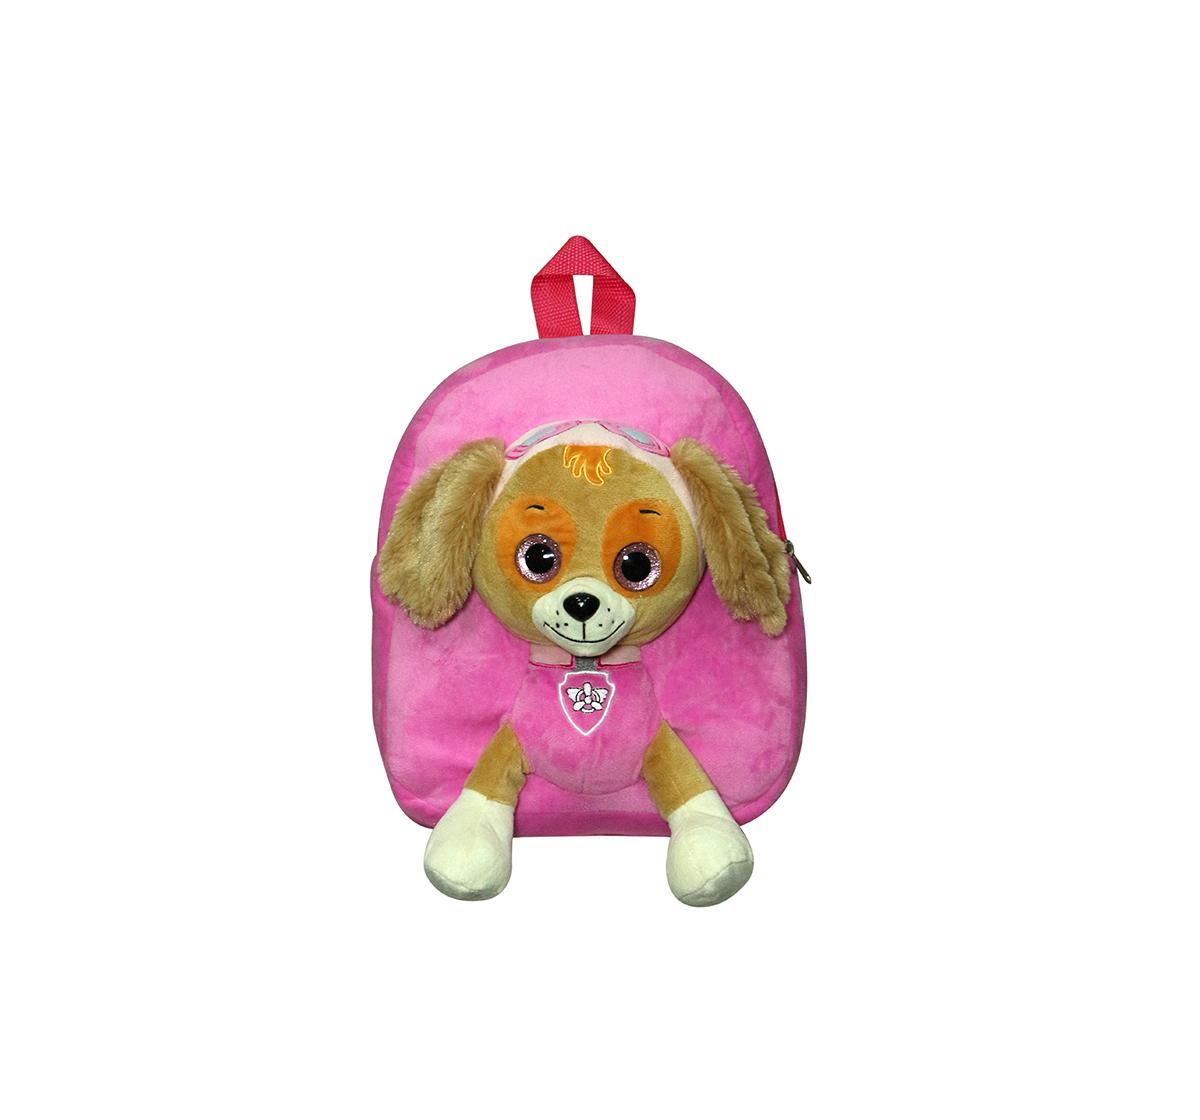 Paw Patrol | Paw Patrol Toy On Bag  Skyee Plush Accessories for Kids age 12M+ - 30.48 Cm